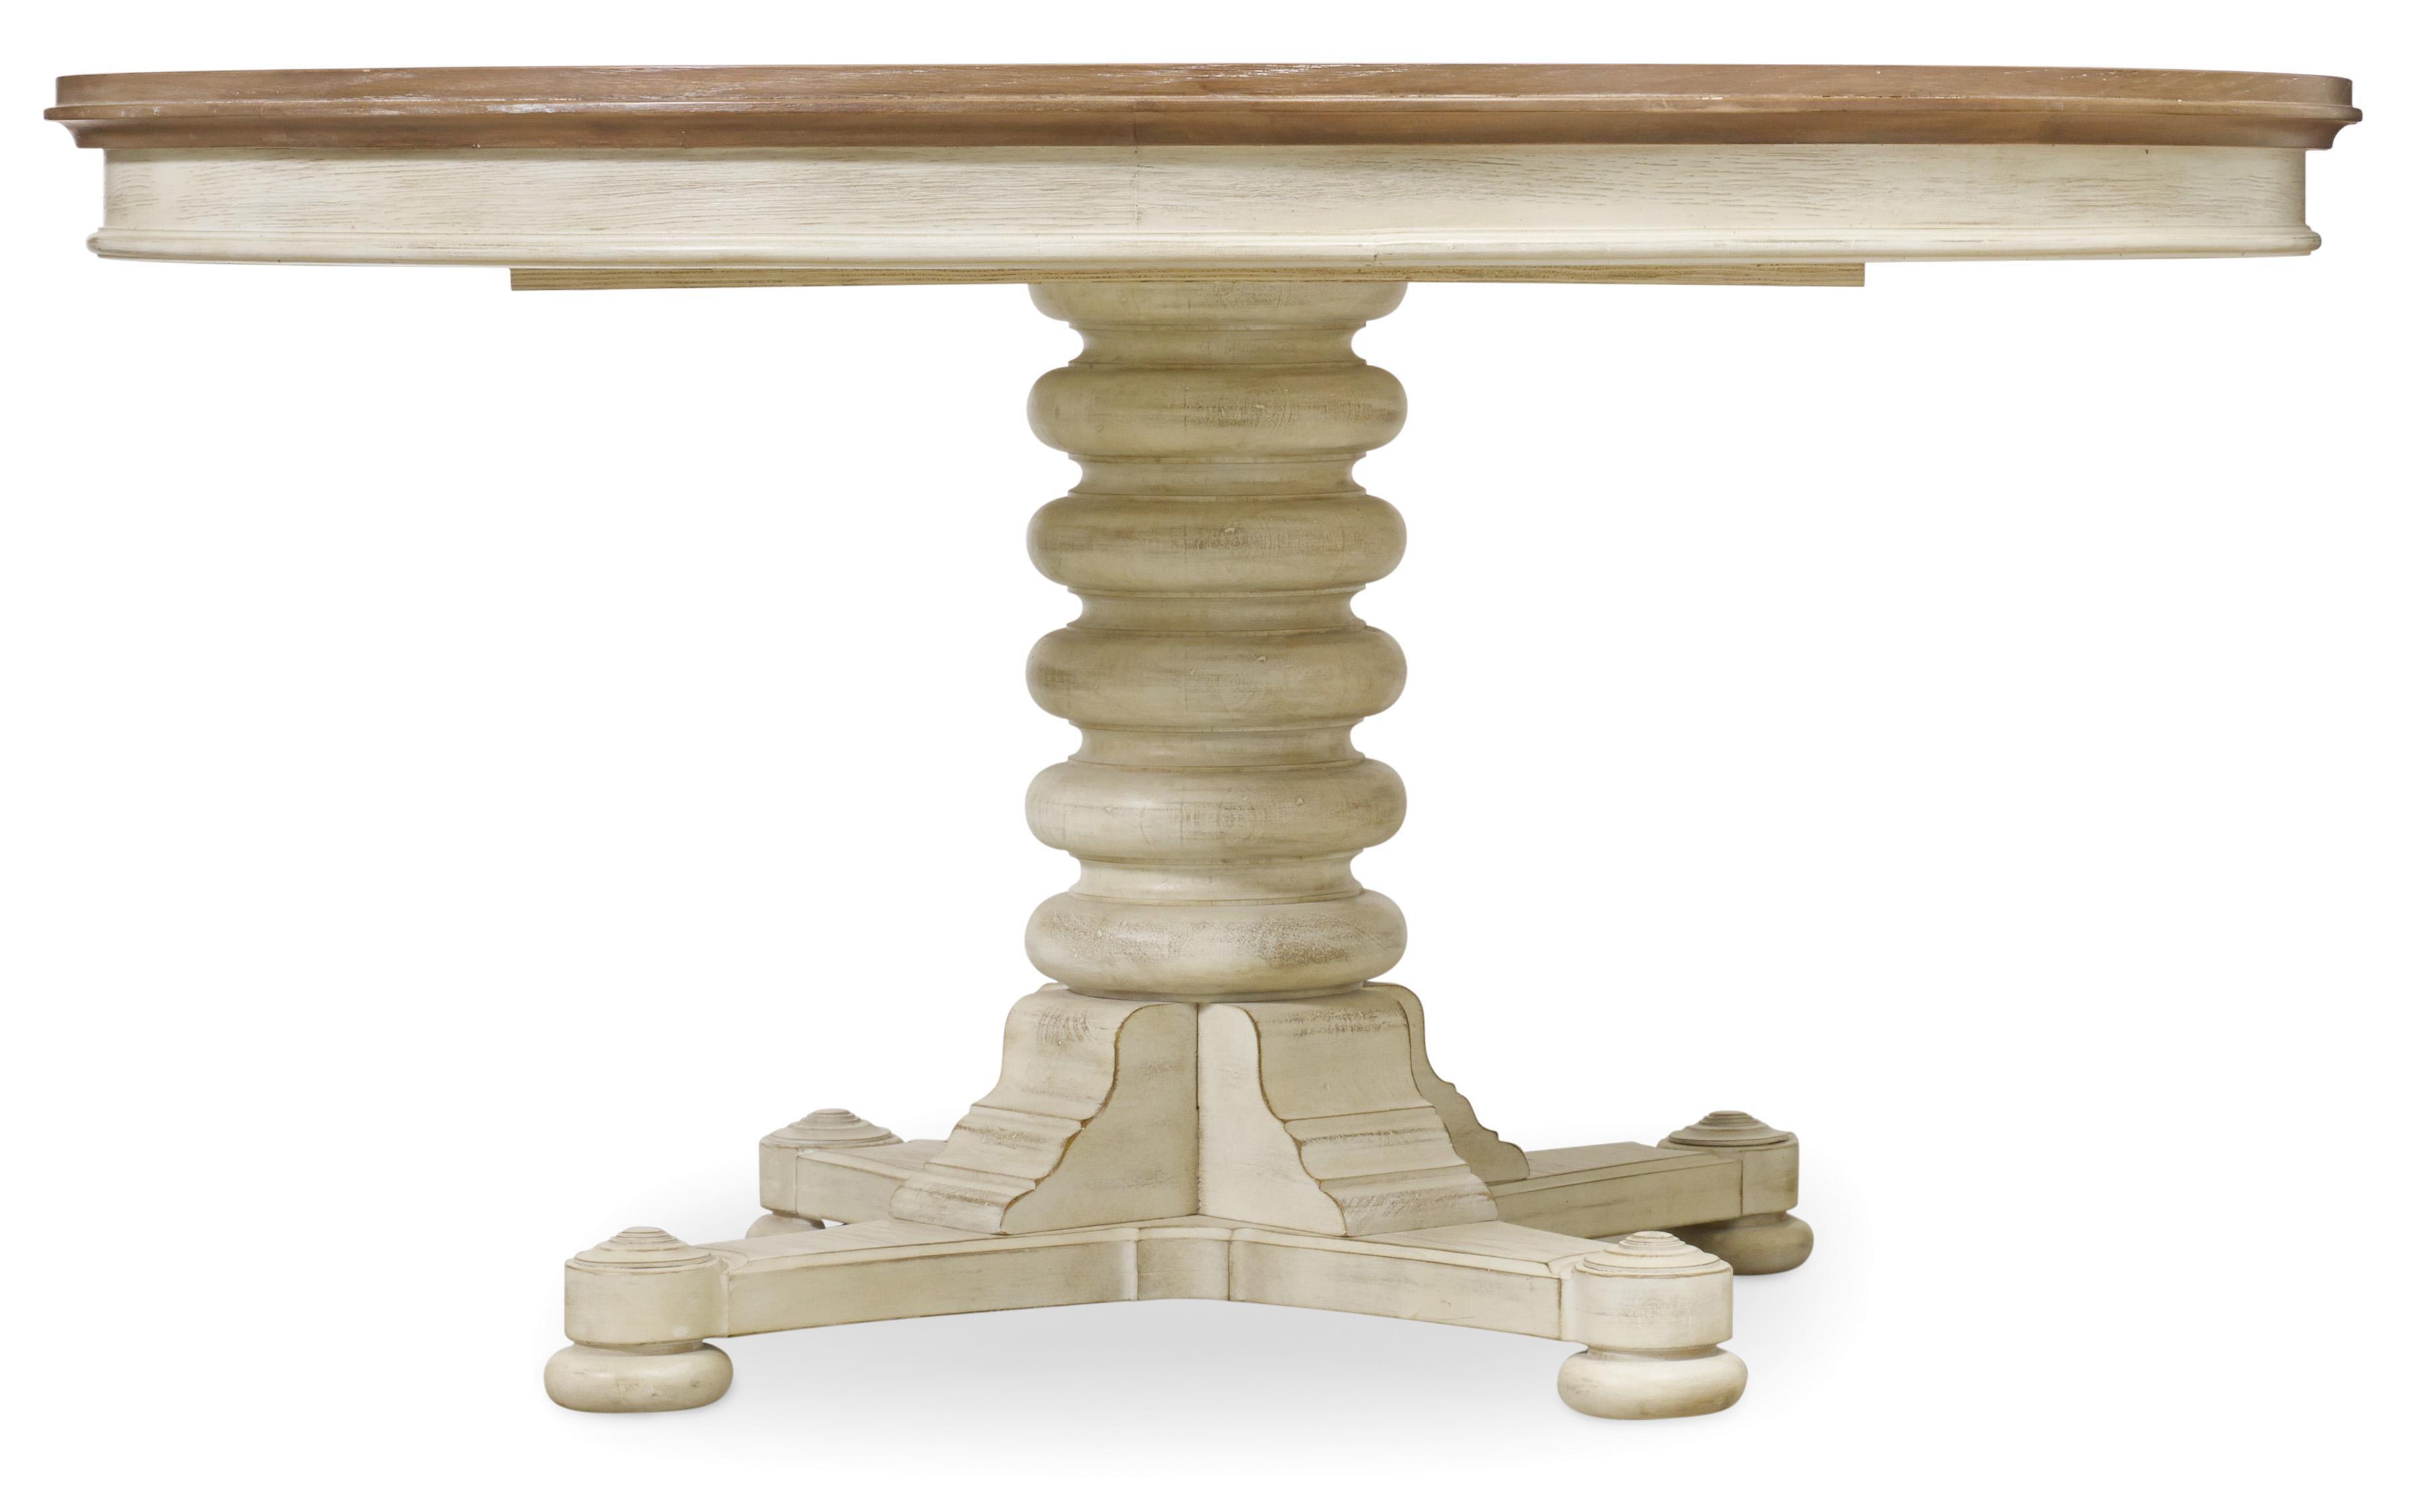 Hooker Furniture Sunset Point Convertible Pedestal Dining Table - Item Number: 5325-75203